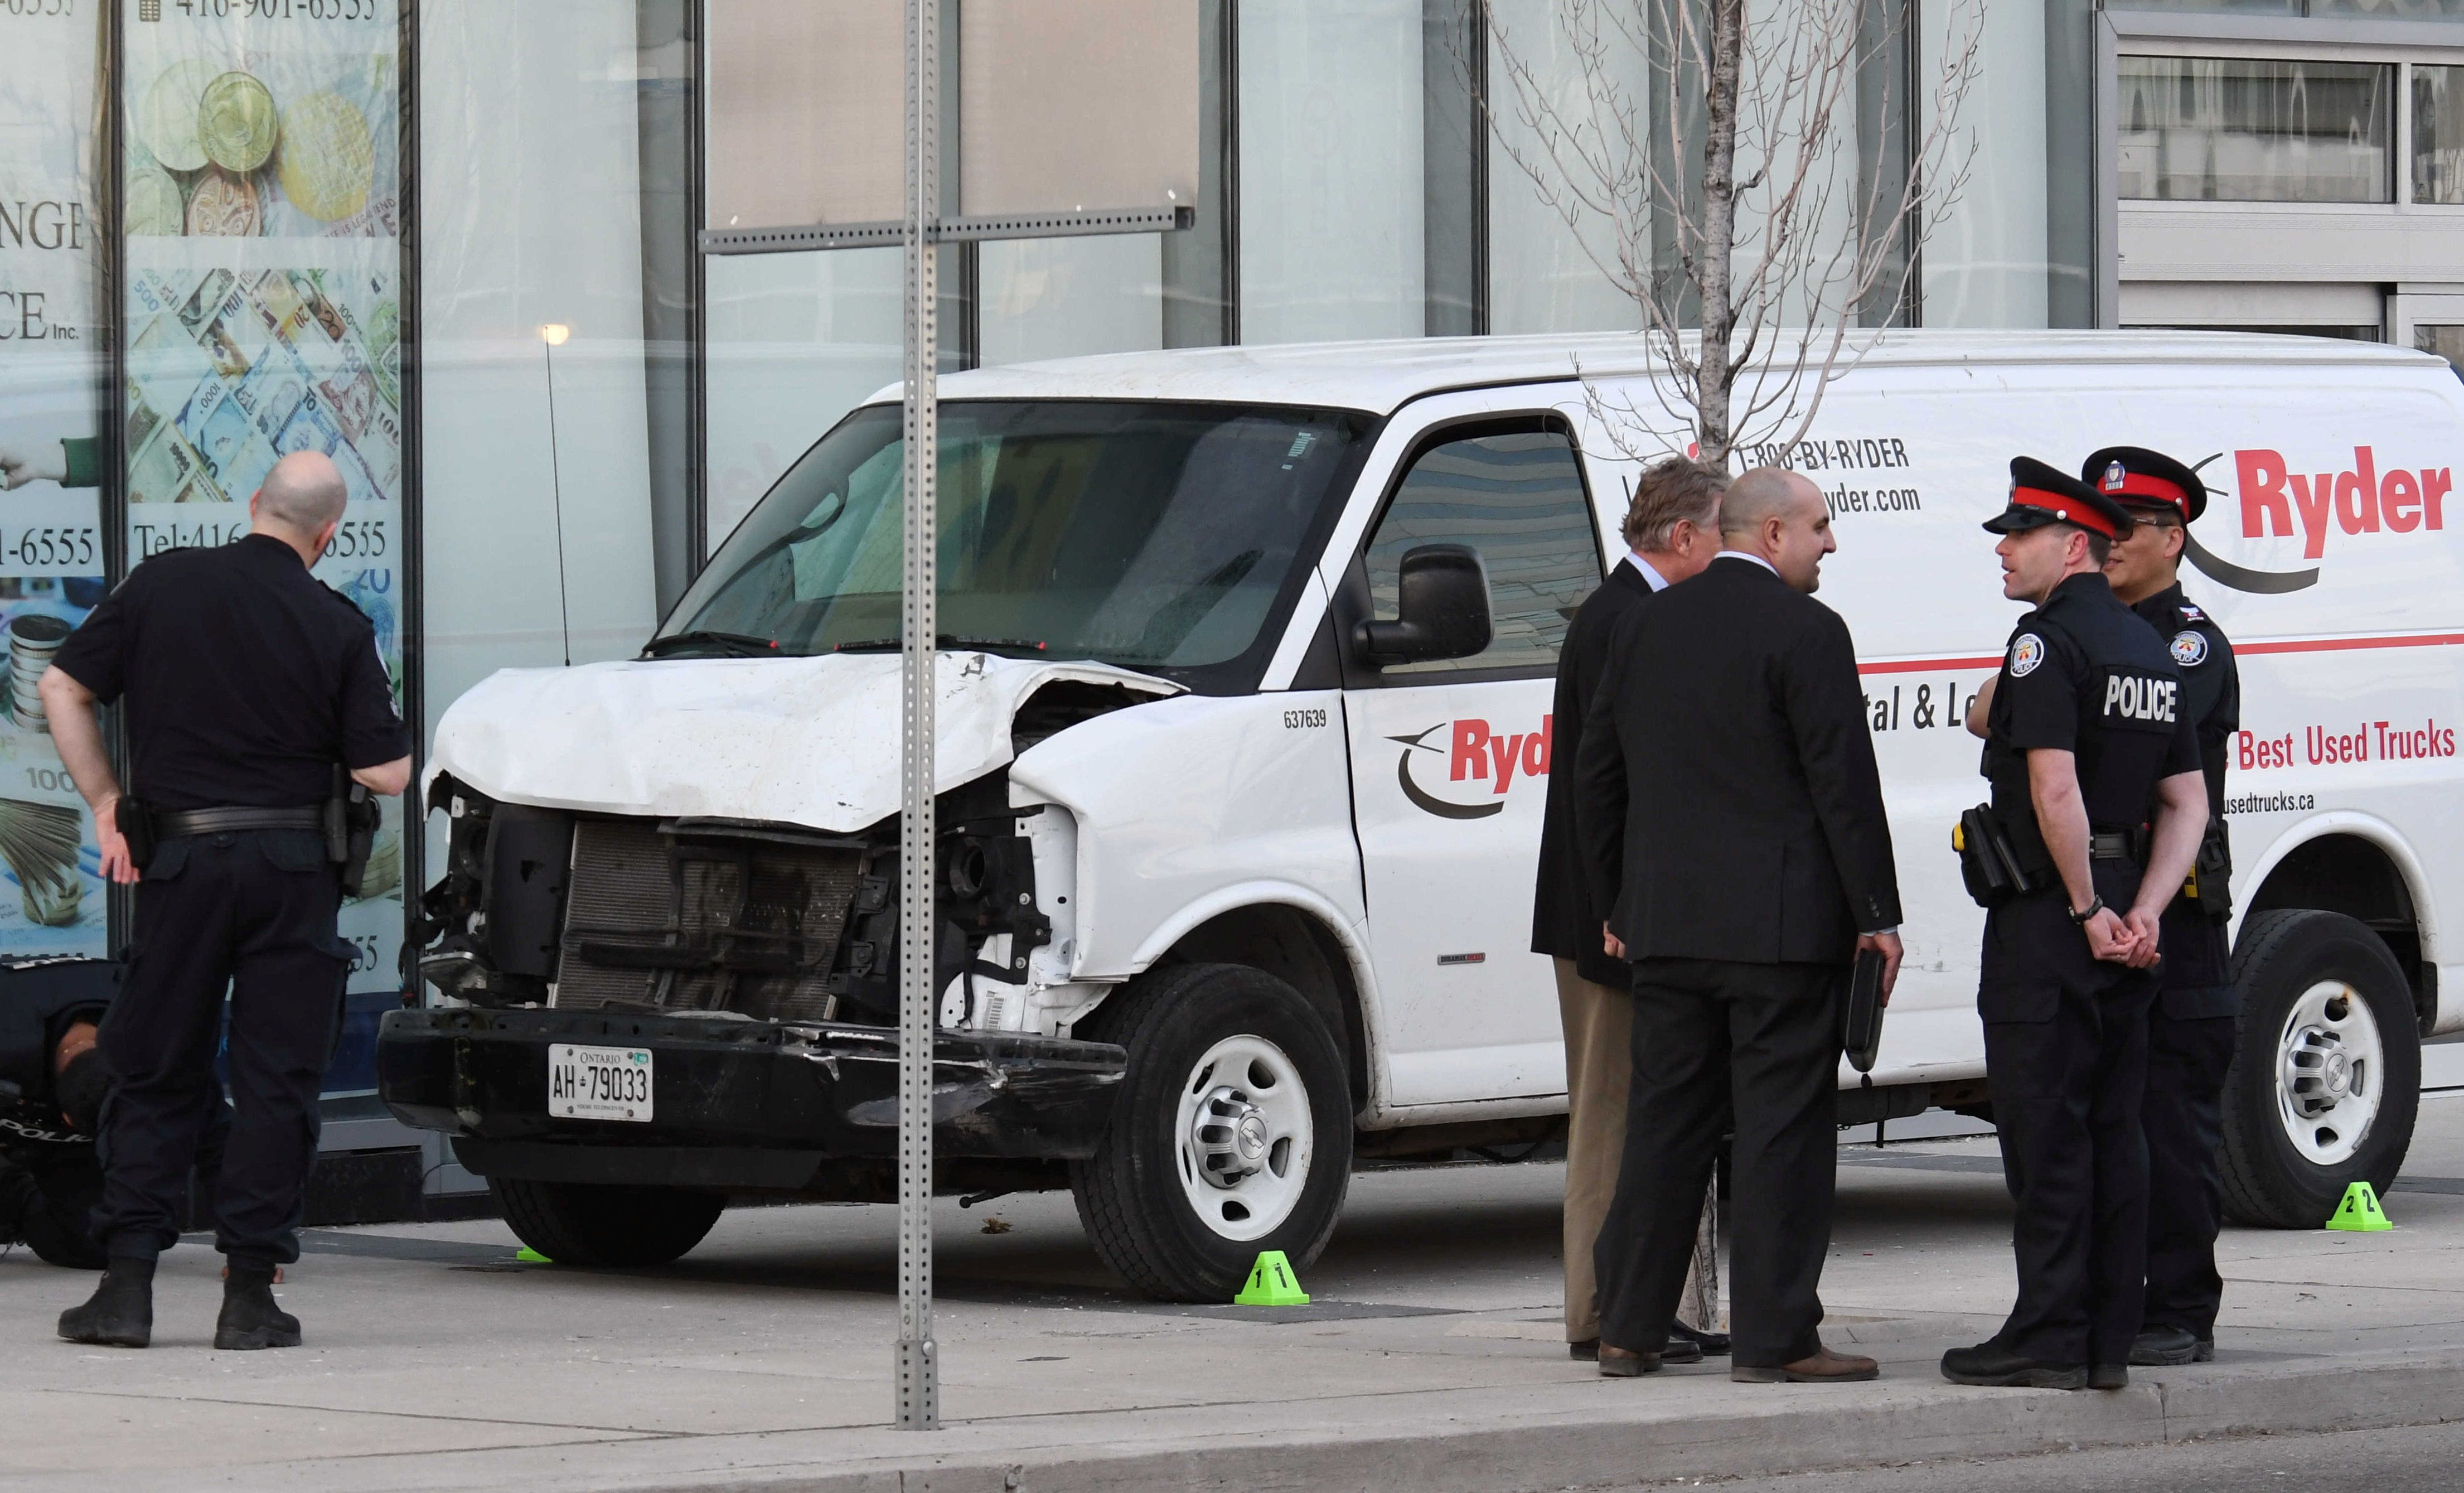 Toronto Van Attack Suspect's Facebook Post Praised Misogynist Mass Killer